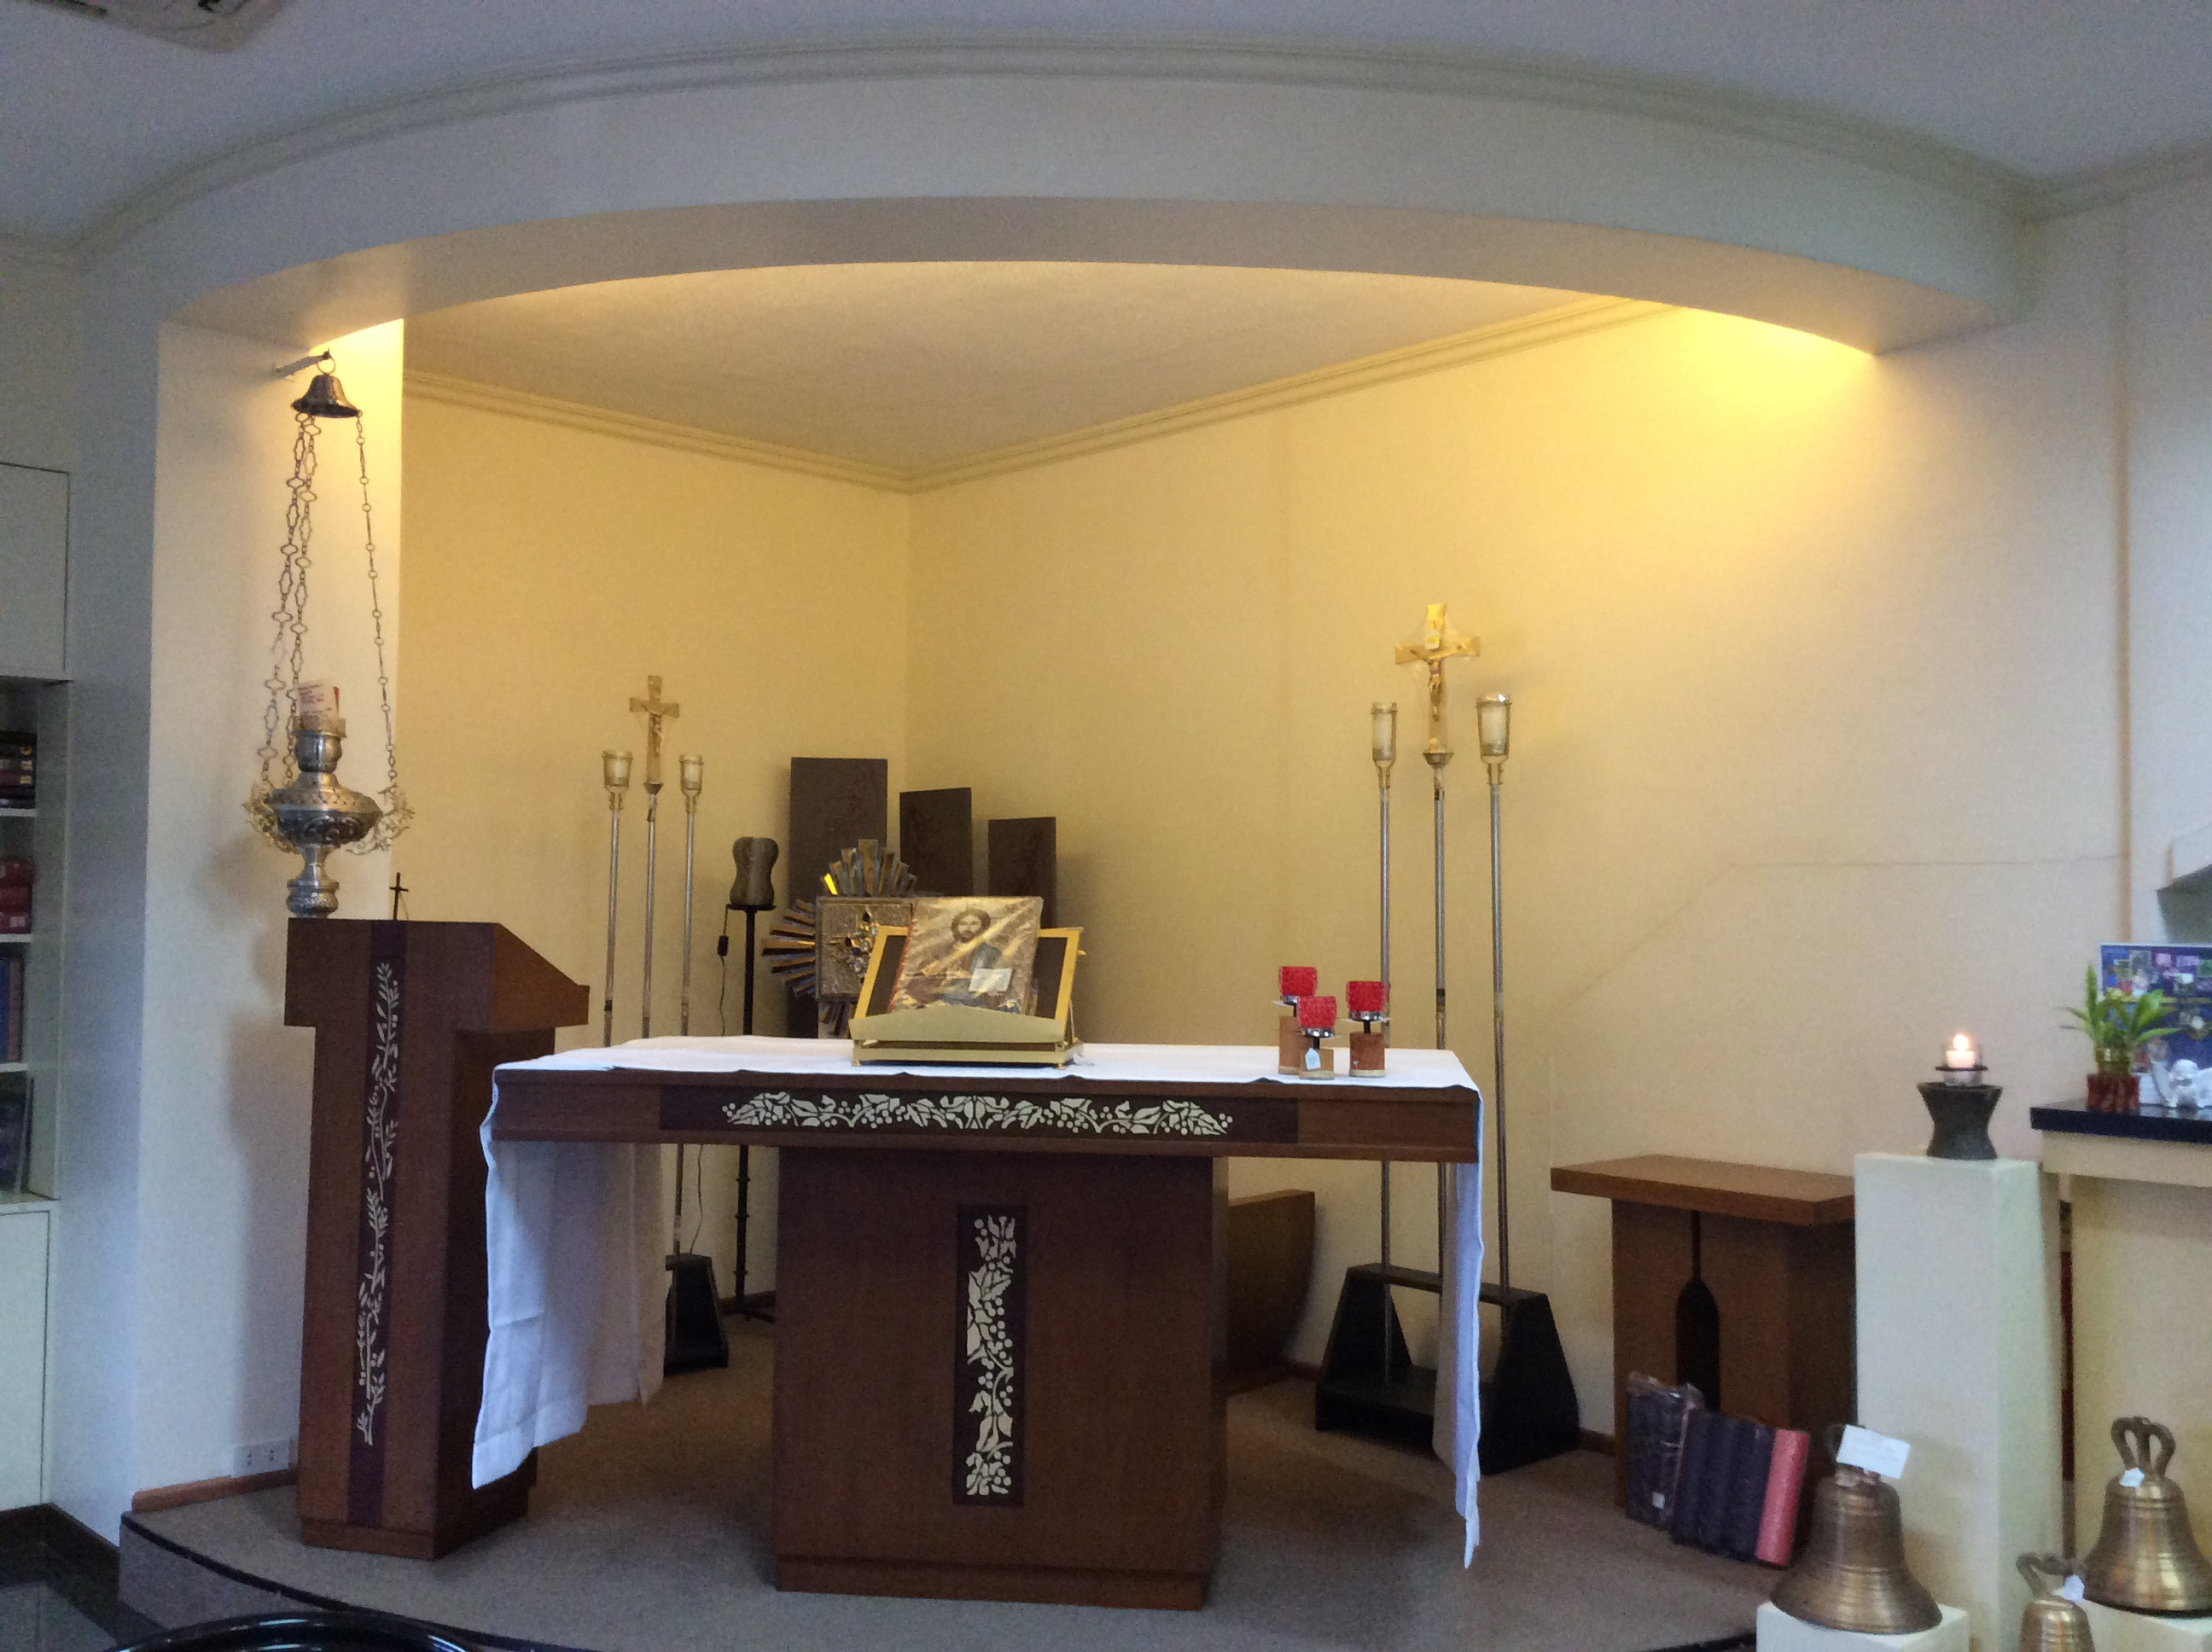 PDDM Apostolic Center